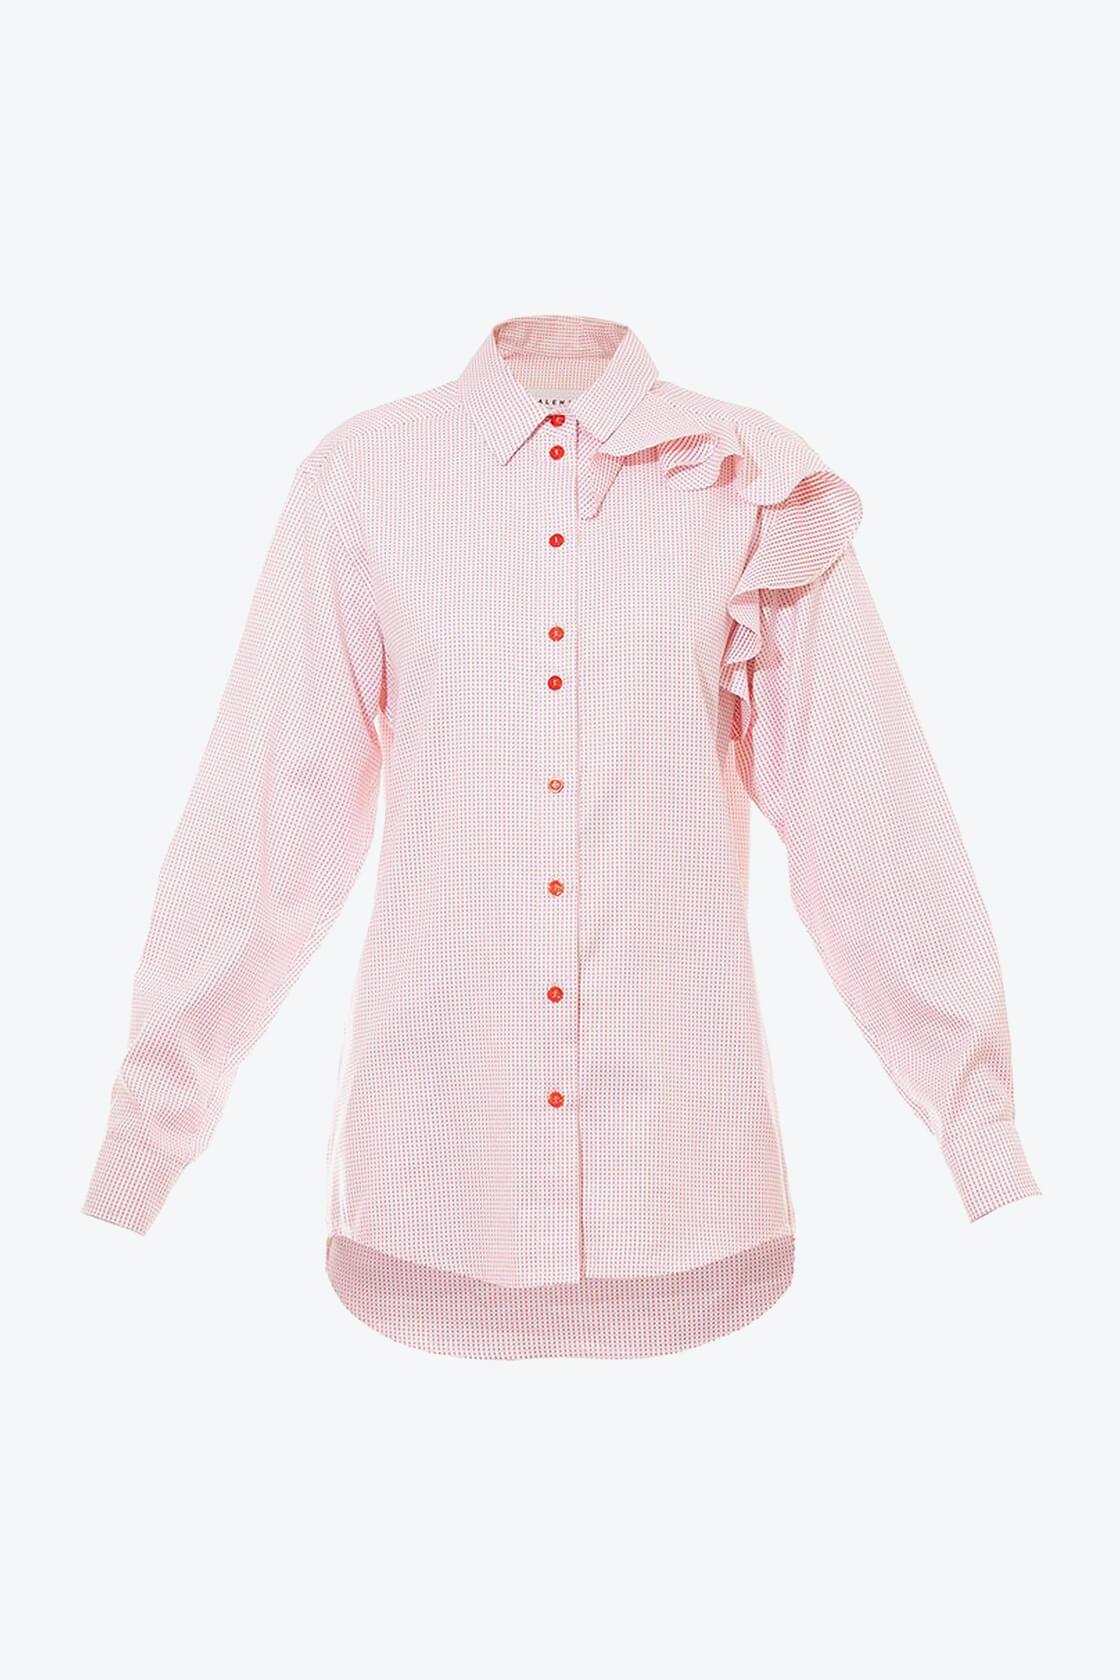 OL10000190 Oversized dotted ruffle shirt1